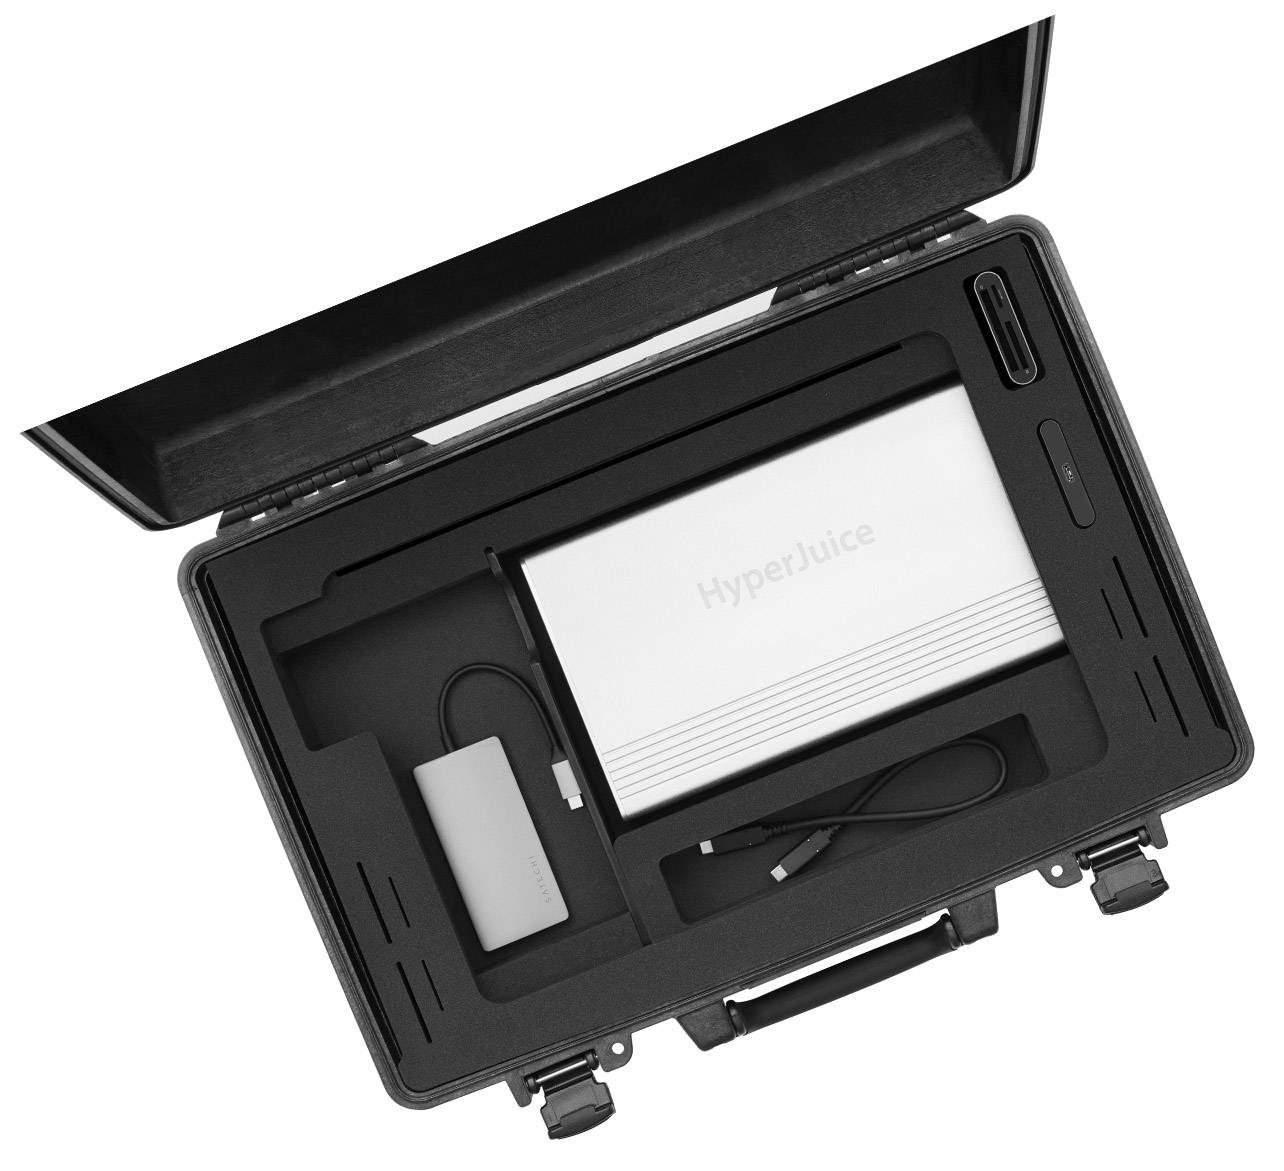 iworkcase open showing equipment storage design  on white